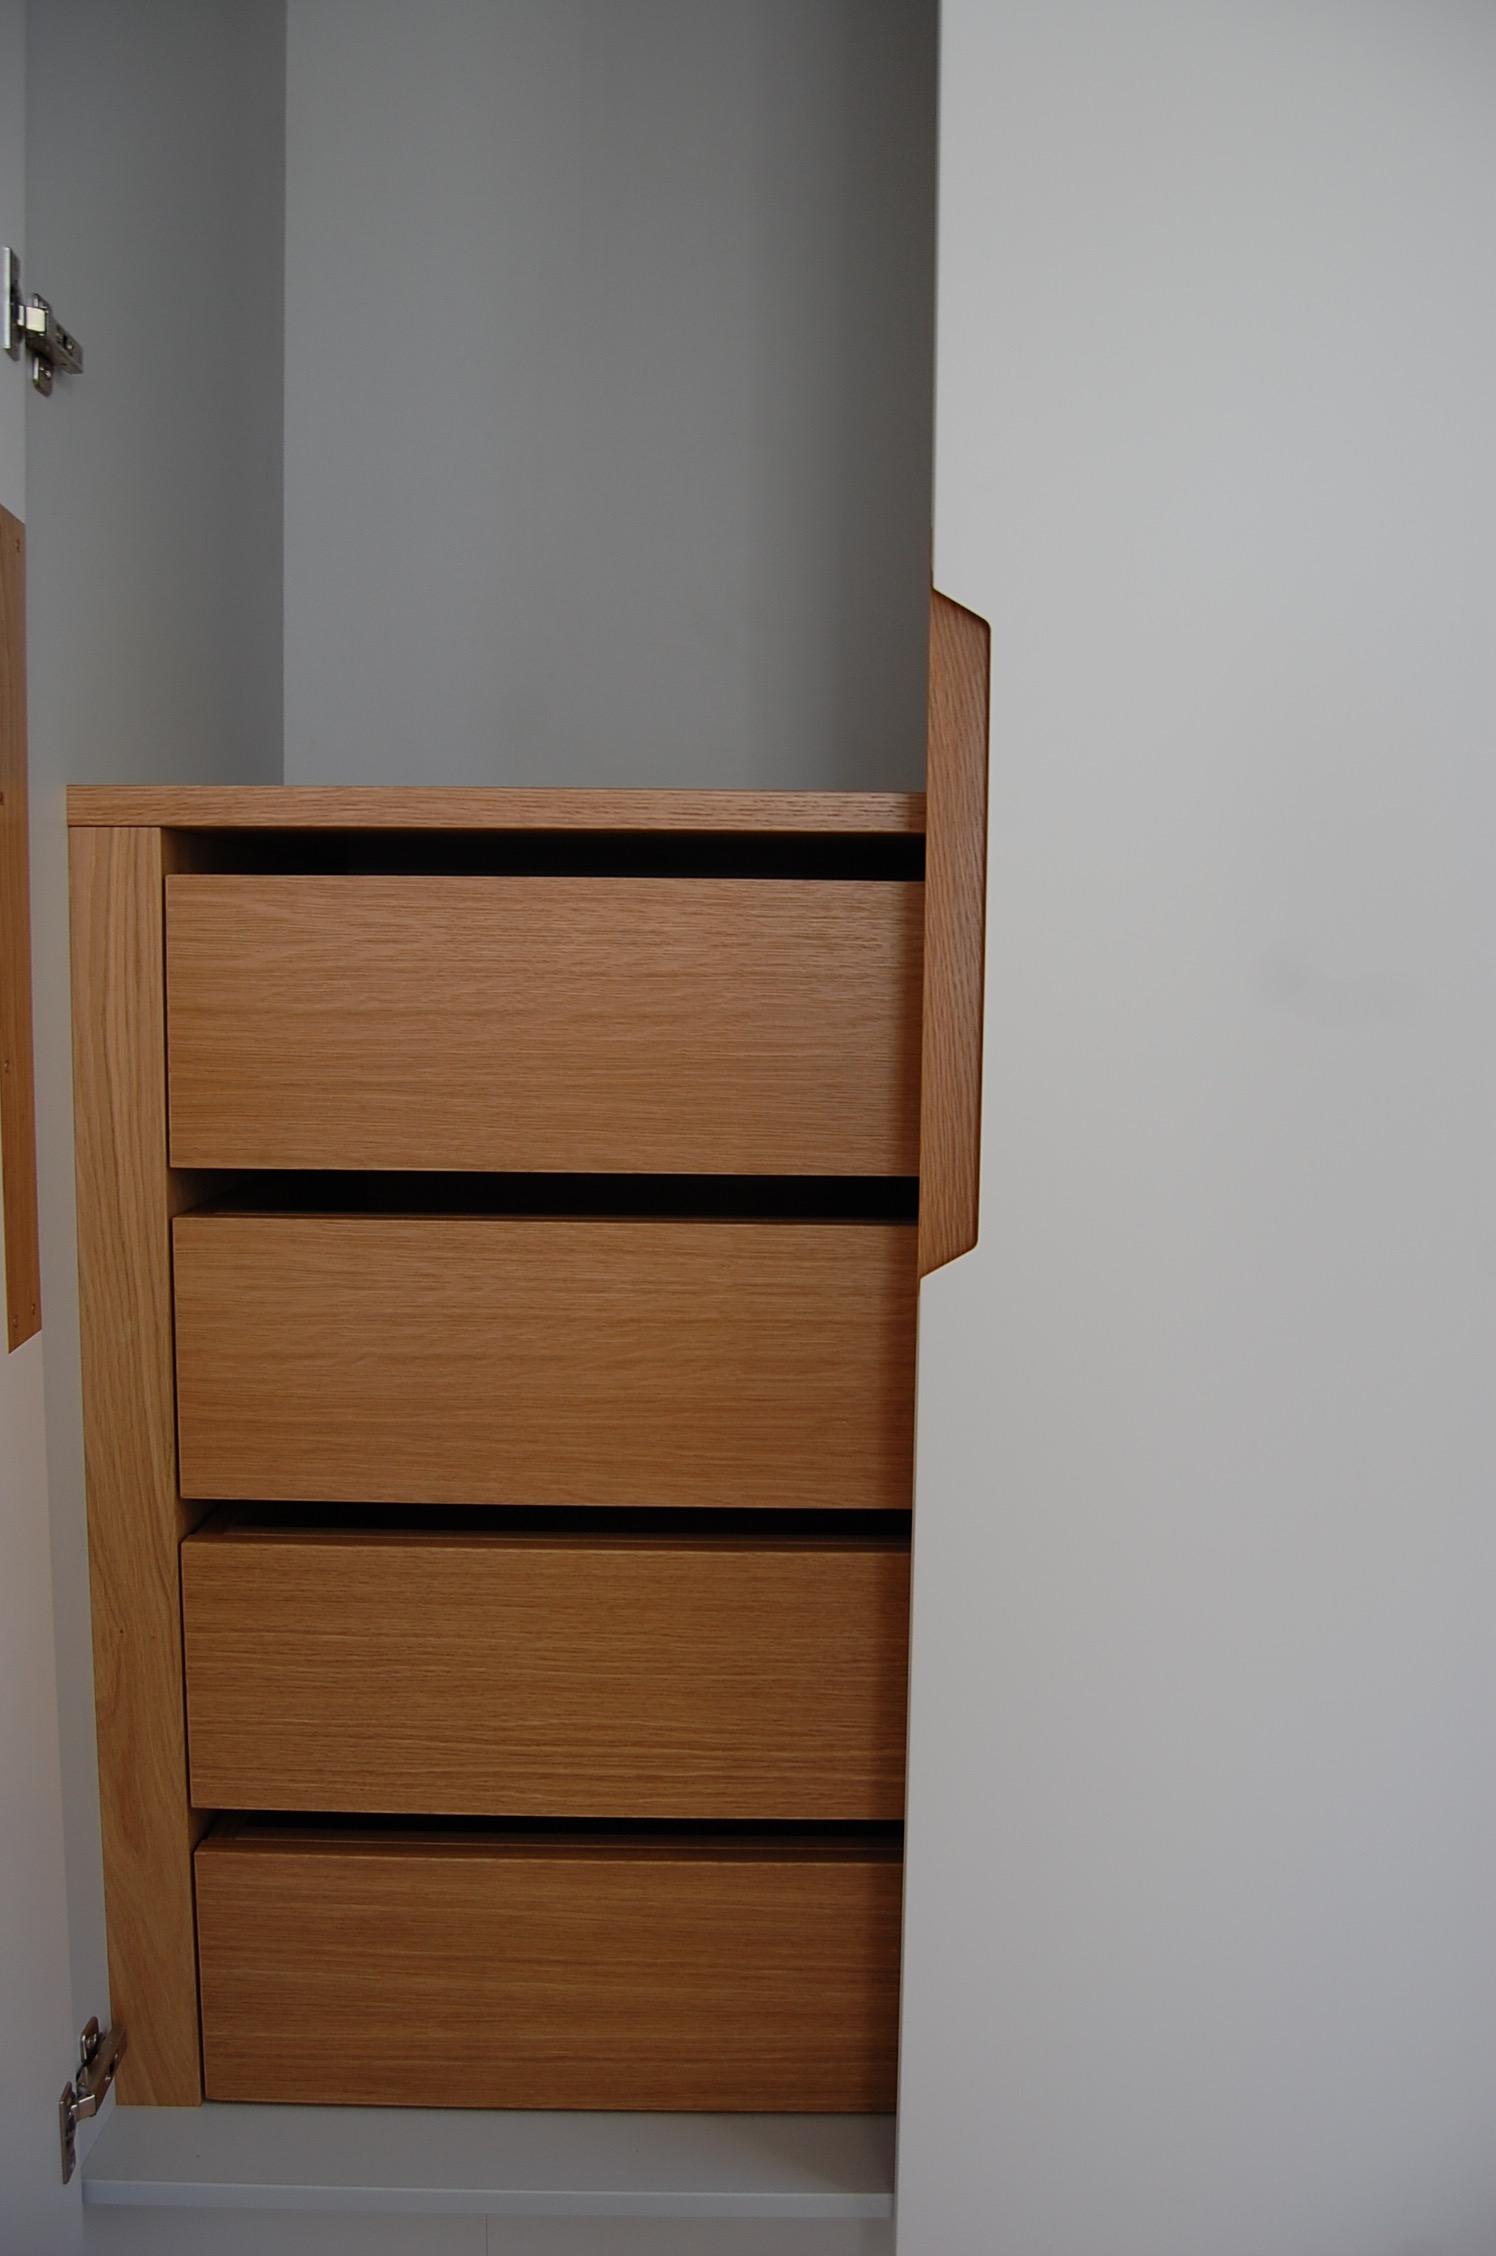 Grain_Bespoke_Furniture_Chelsea_Wardrobe_3.jpg